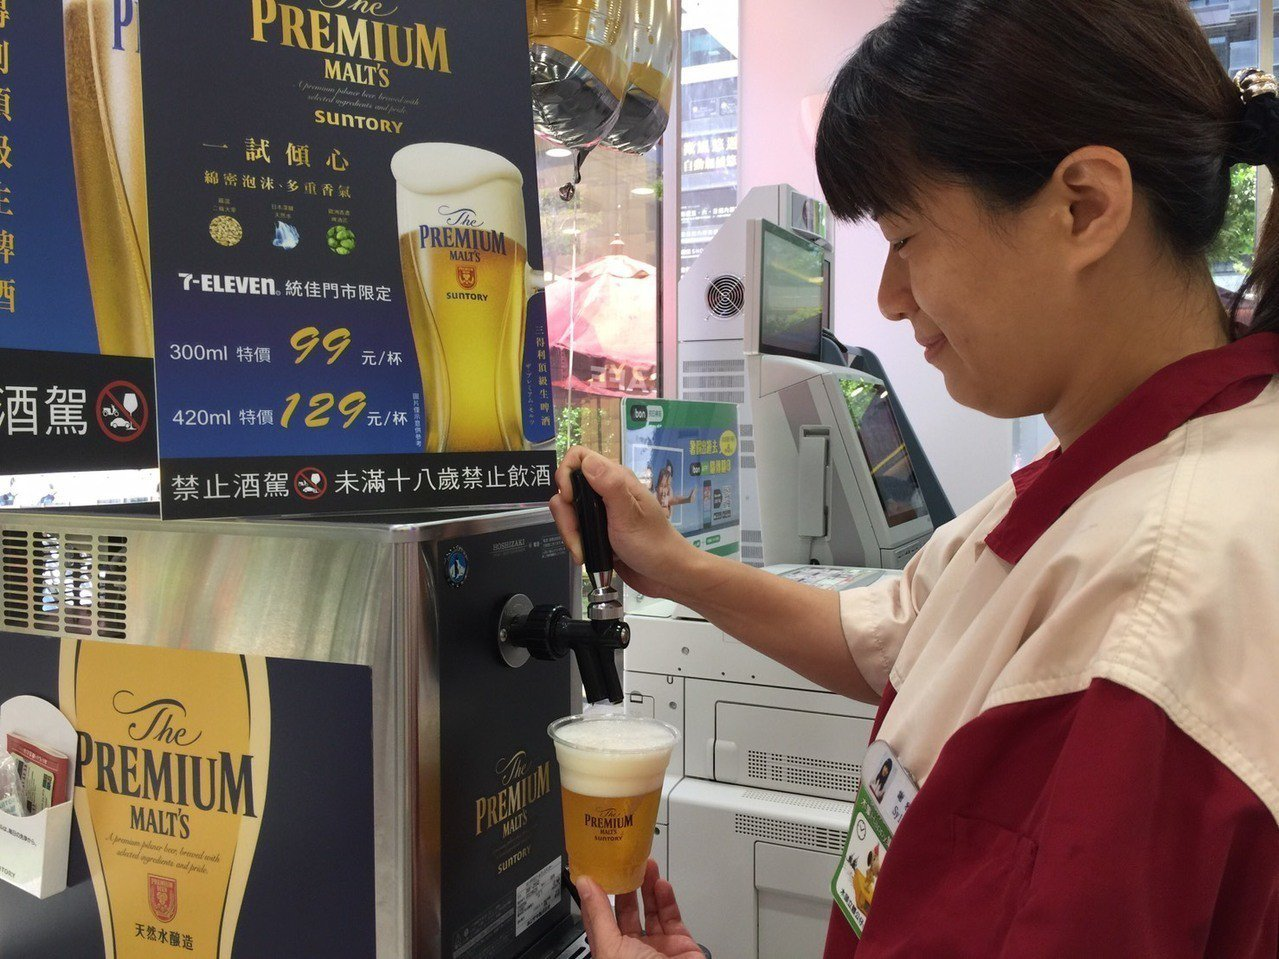 7-ELEVEN引進日本三得利生啤酒機,目前銷量穩定成長。圖/7-ELEVEN提...